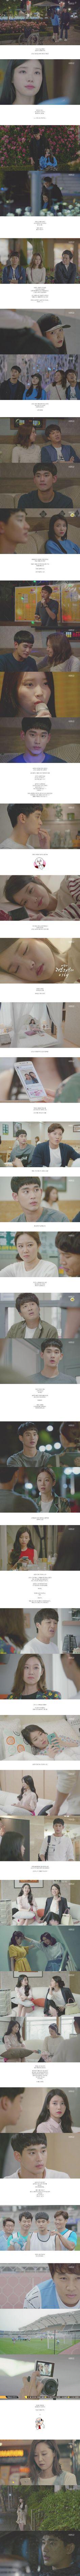 [Spoiler] Added episodes 7 and 8 captures for the Korean drama 'Producers' @ HanCinema :: The Korean Movie and Drama Database Cha Tae Hyun, Kim Jong Kook, Gong Hyo Jin, Korean Singer, Korean Drama, Kdrama, Movie, Film, Drama Korea